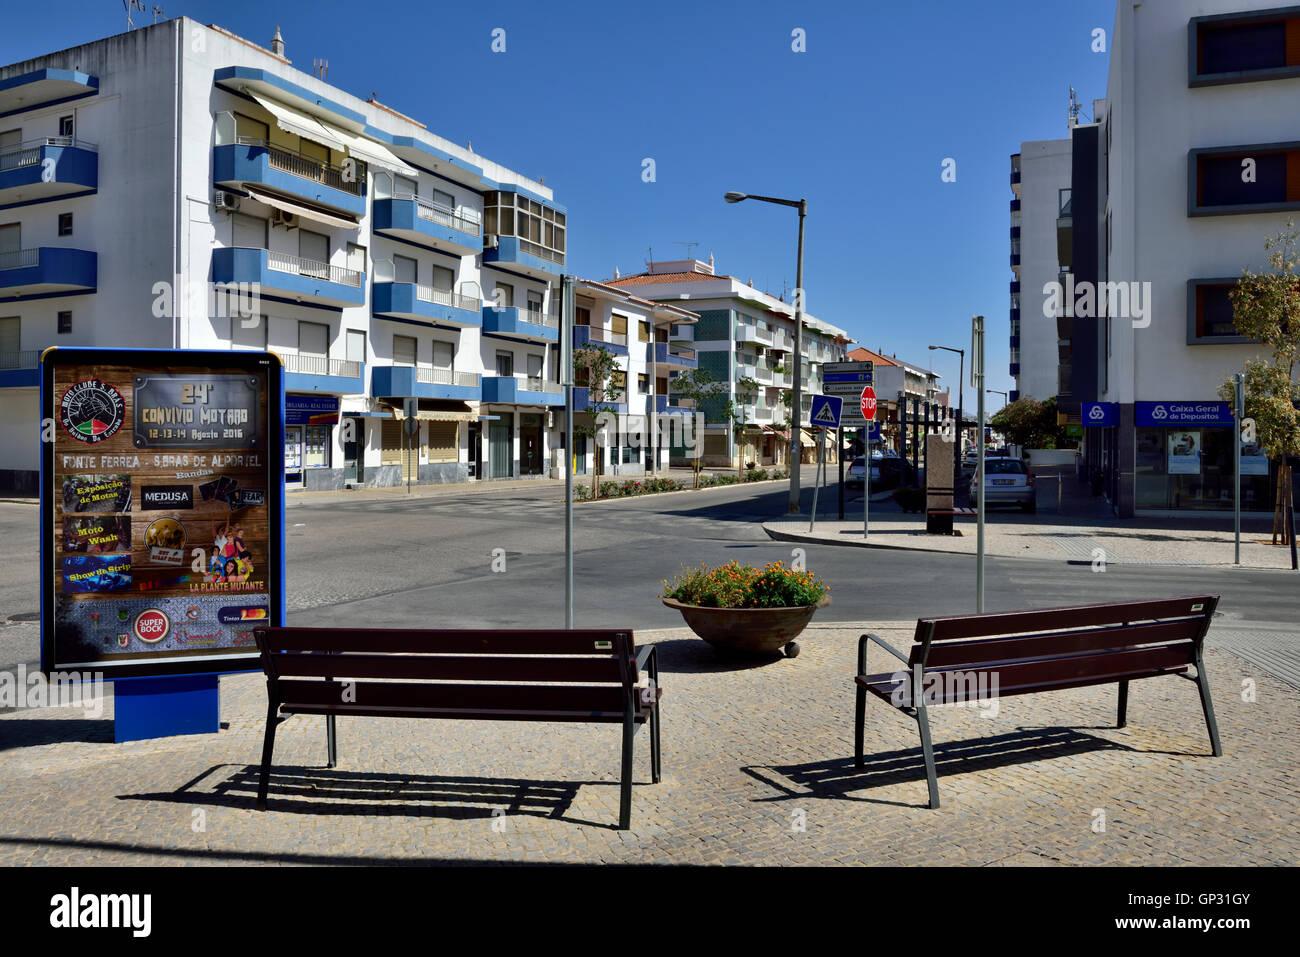 Sao Bras de Alportel main street, Algarve, south Portugal - Stock Image